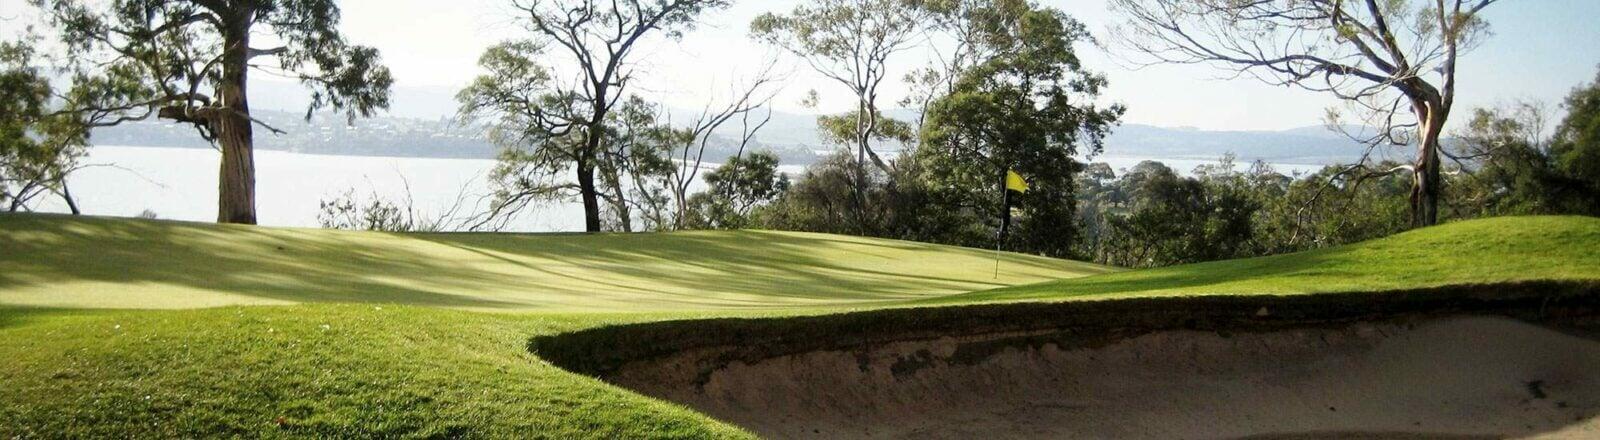 Golf hole panorama view